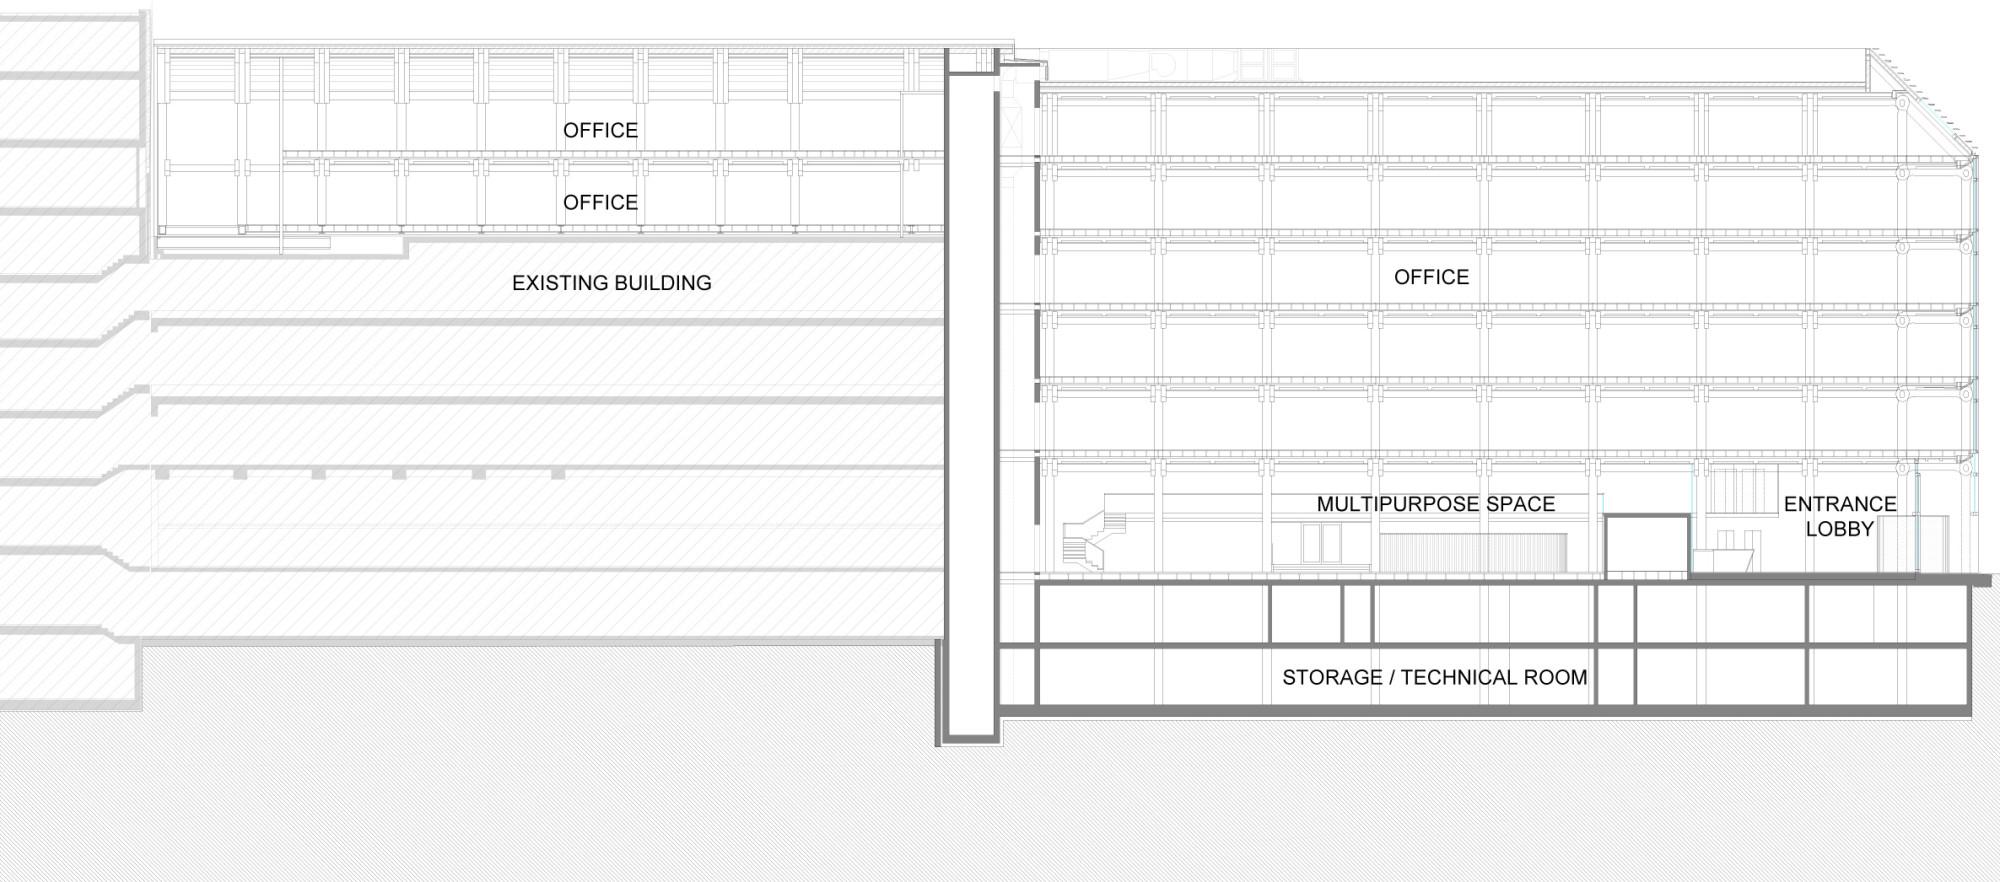 mehrgeschossiger b ro holzbau in z rich geneigtes dach. Black Bedroom Furniture Sets. Home Design Ideas